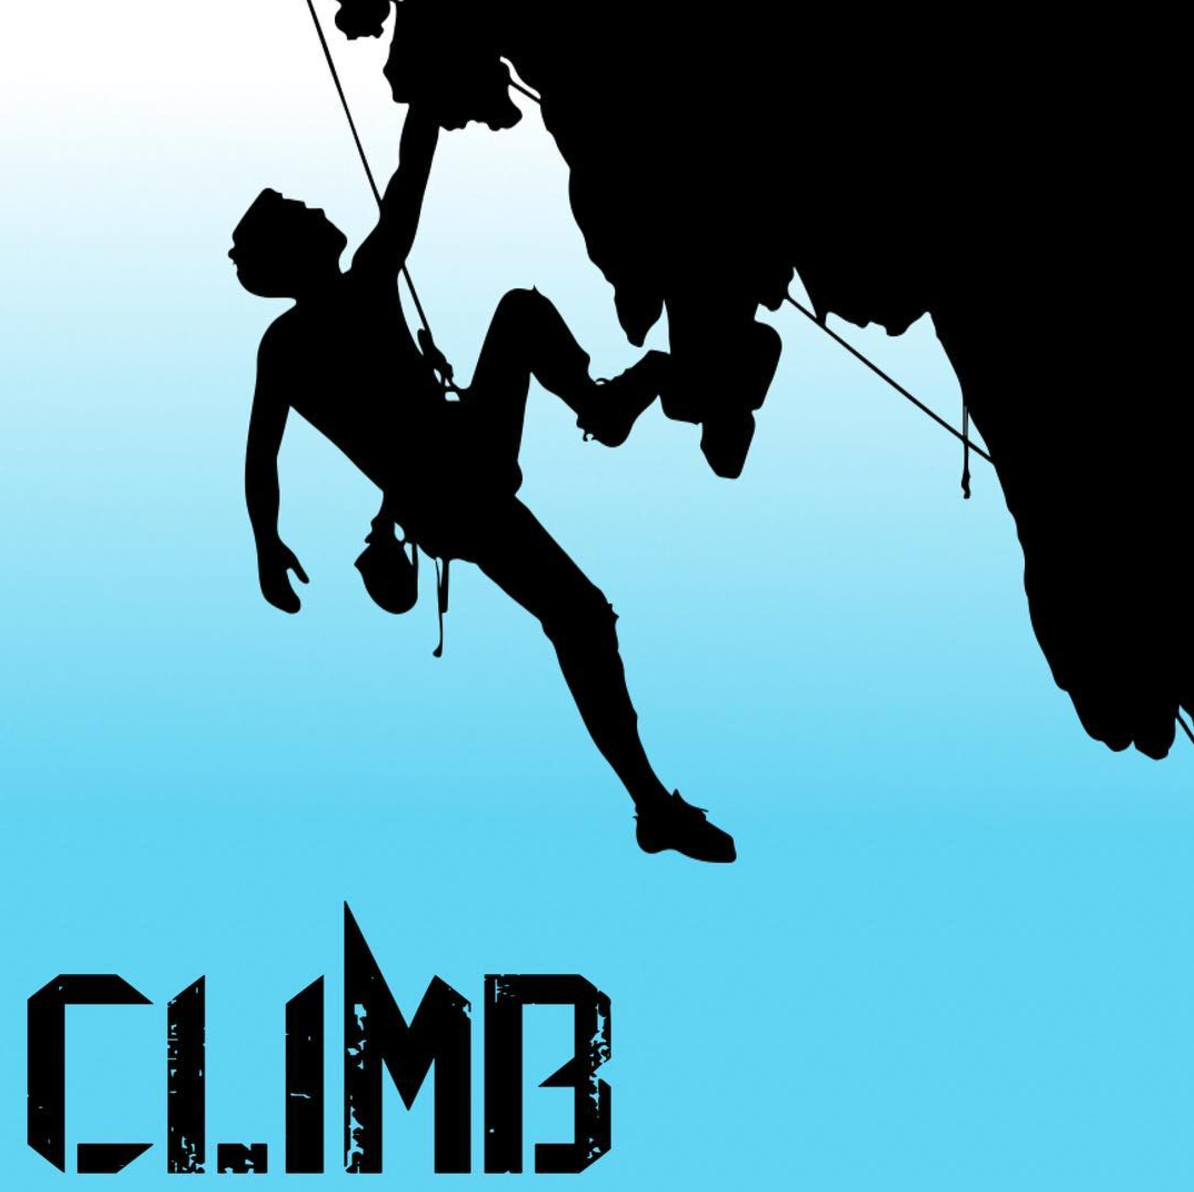 Climb Graphic